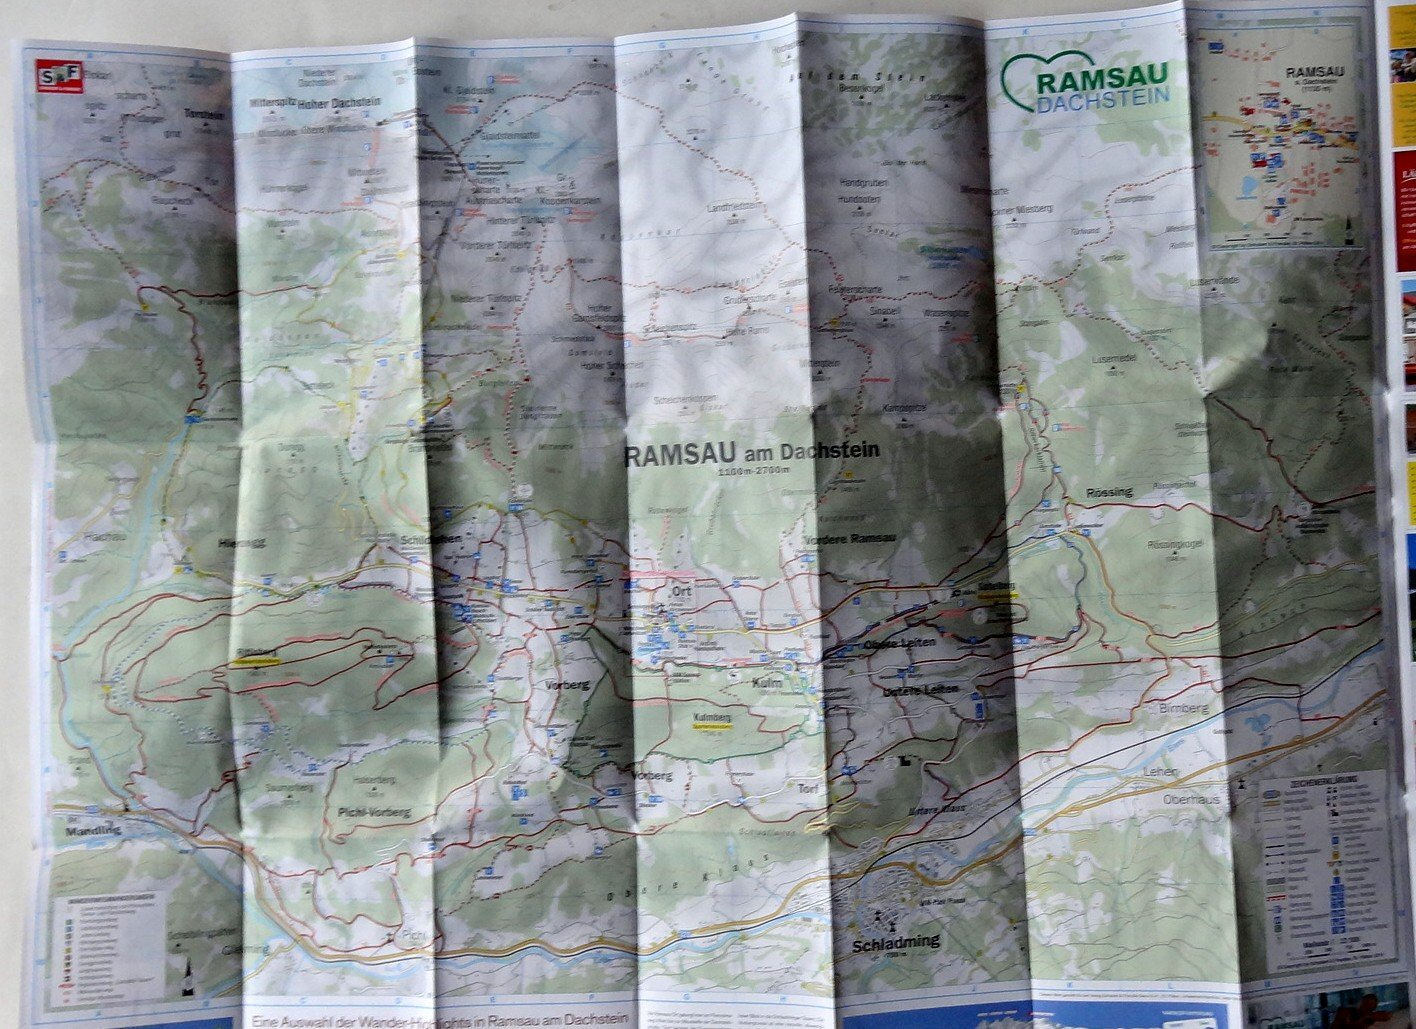 Wanderkarte ramsau 1:22500 inklusive panoramakarte